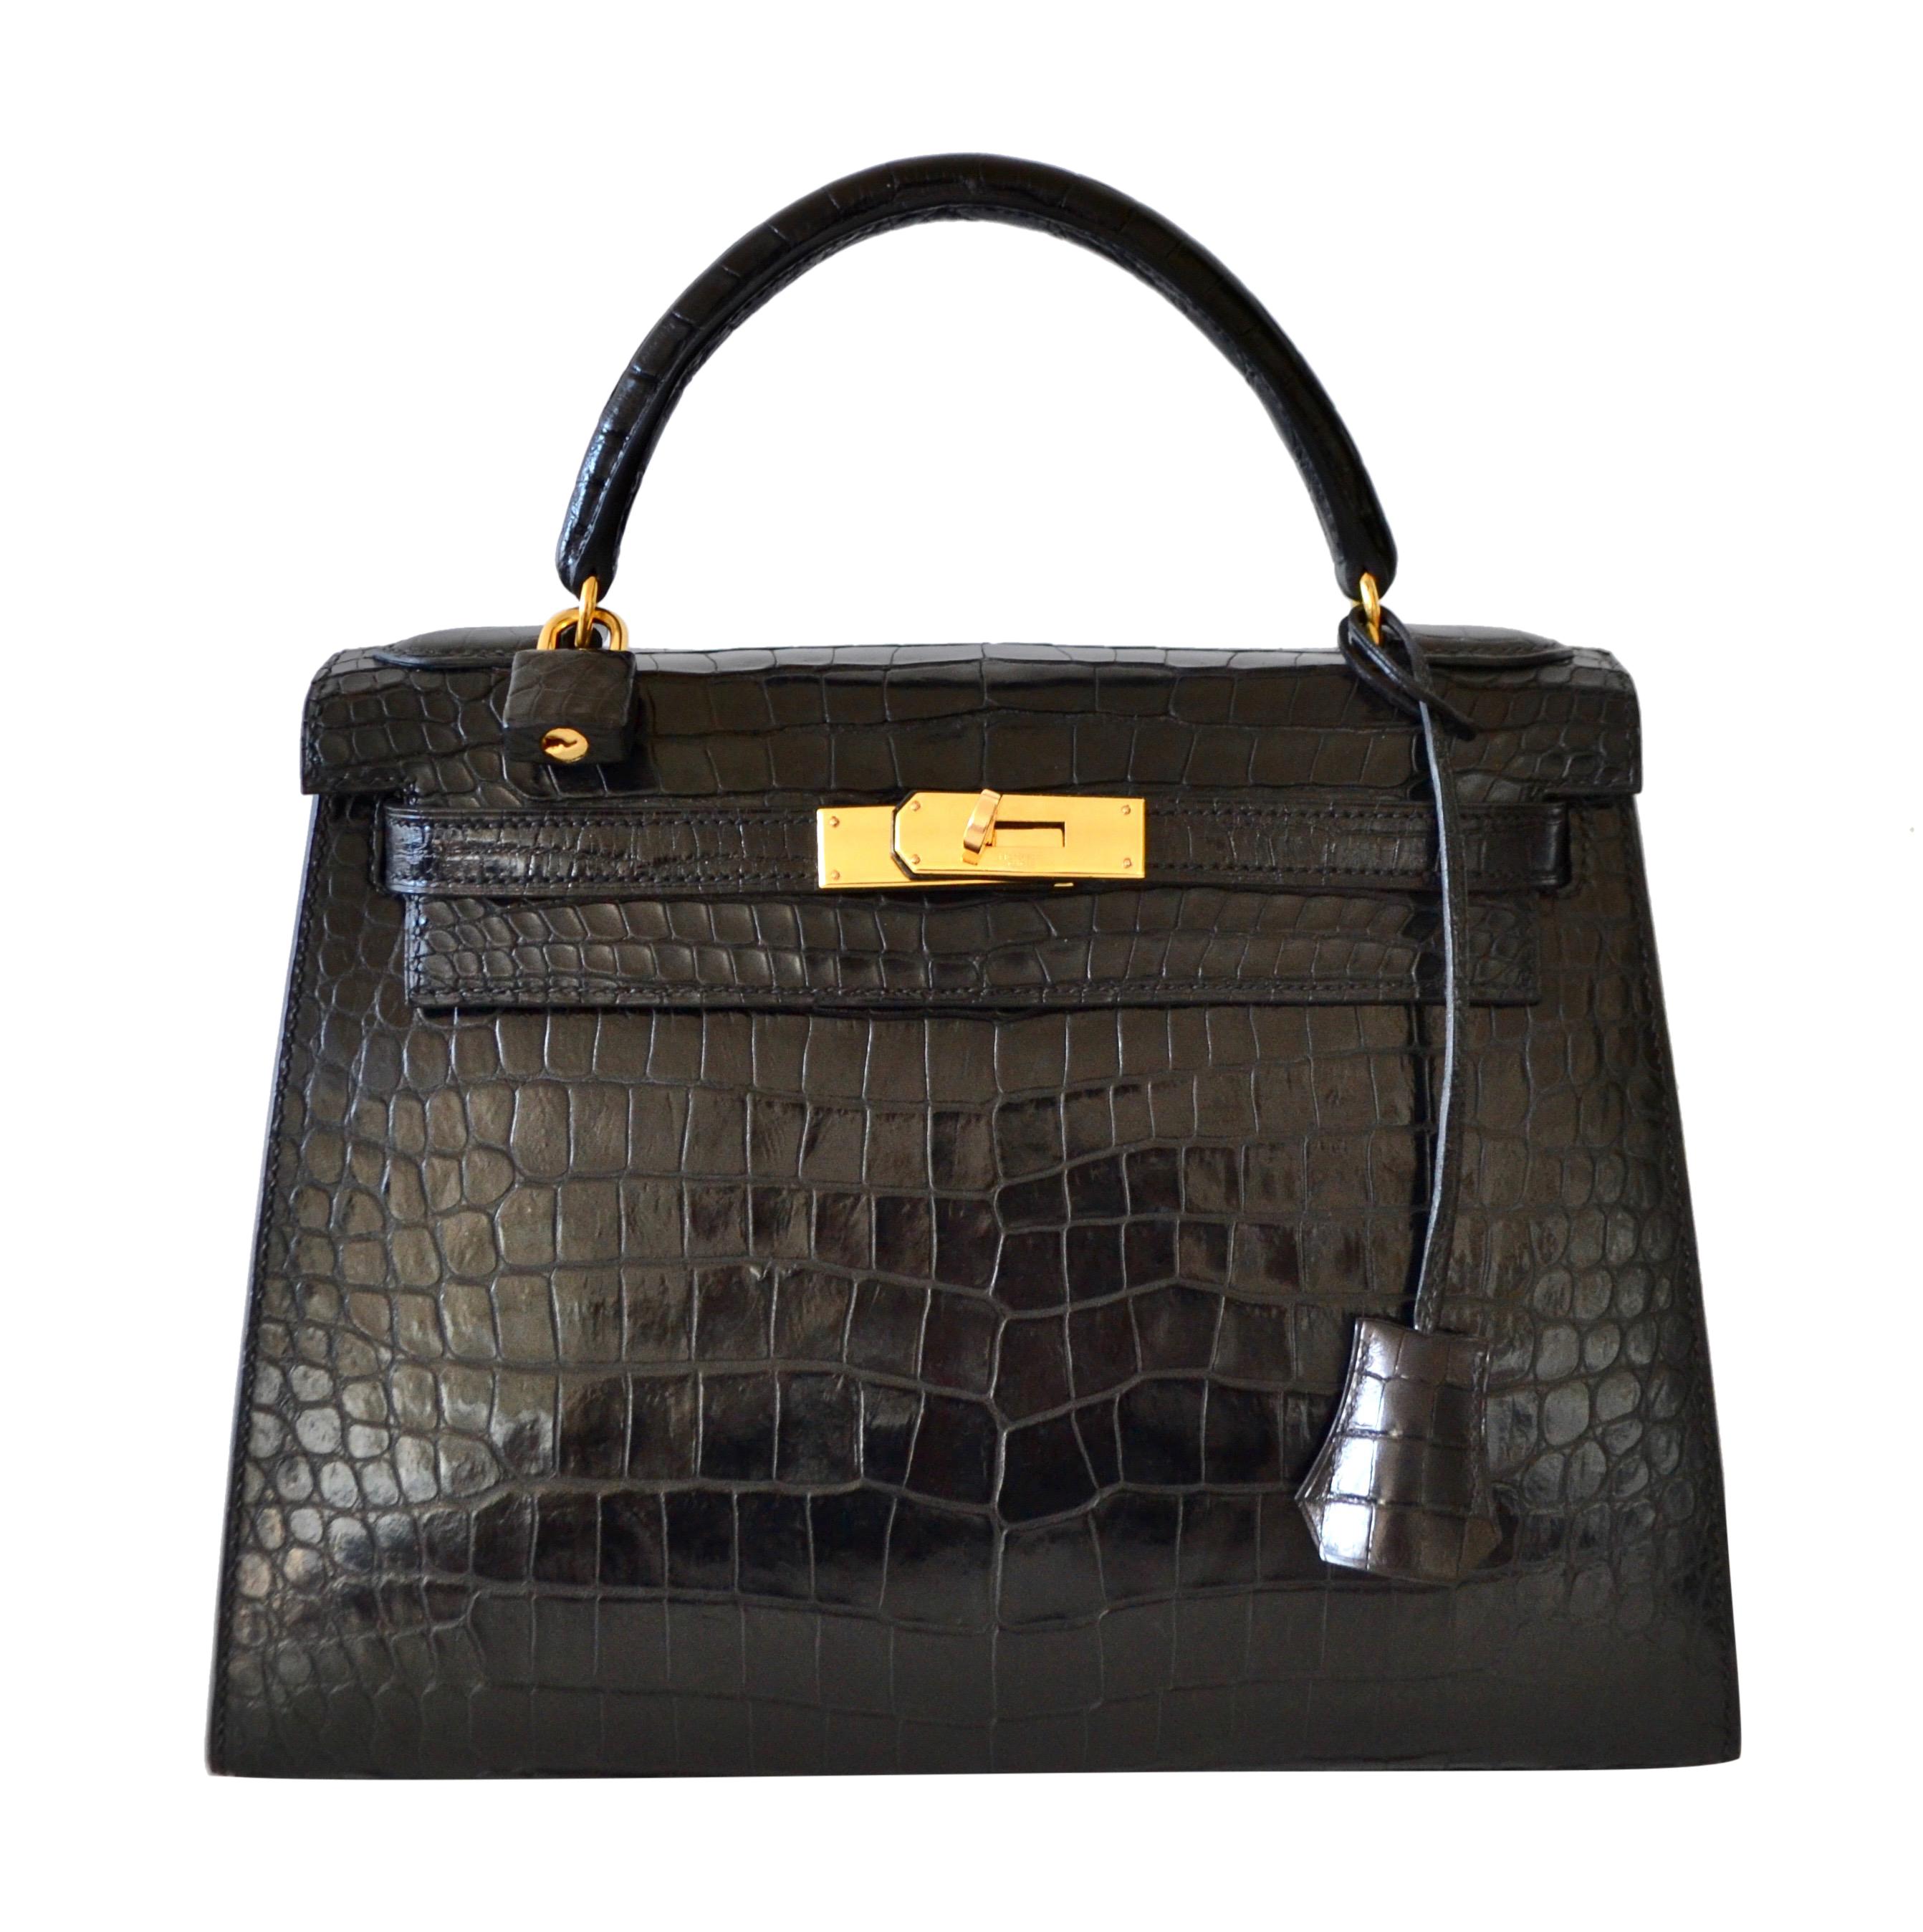 Sac Hermès Kelly 28 Crocodile Noir